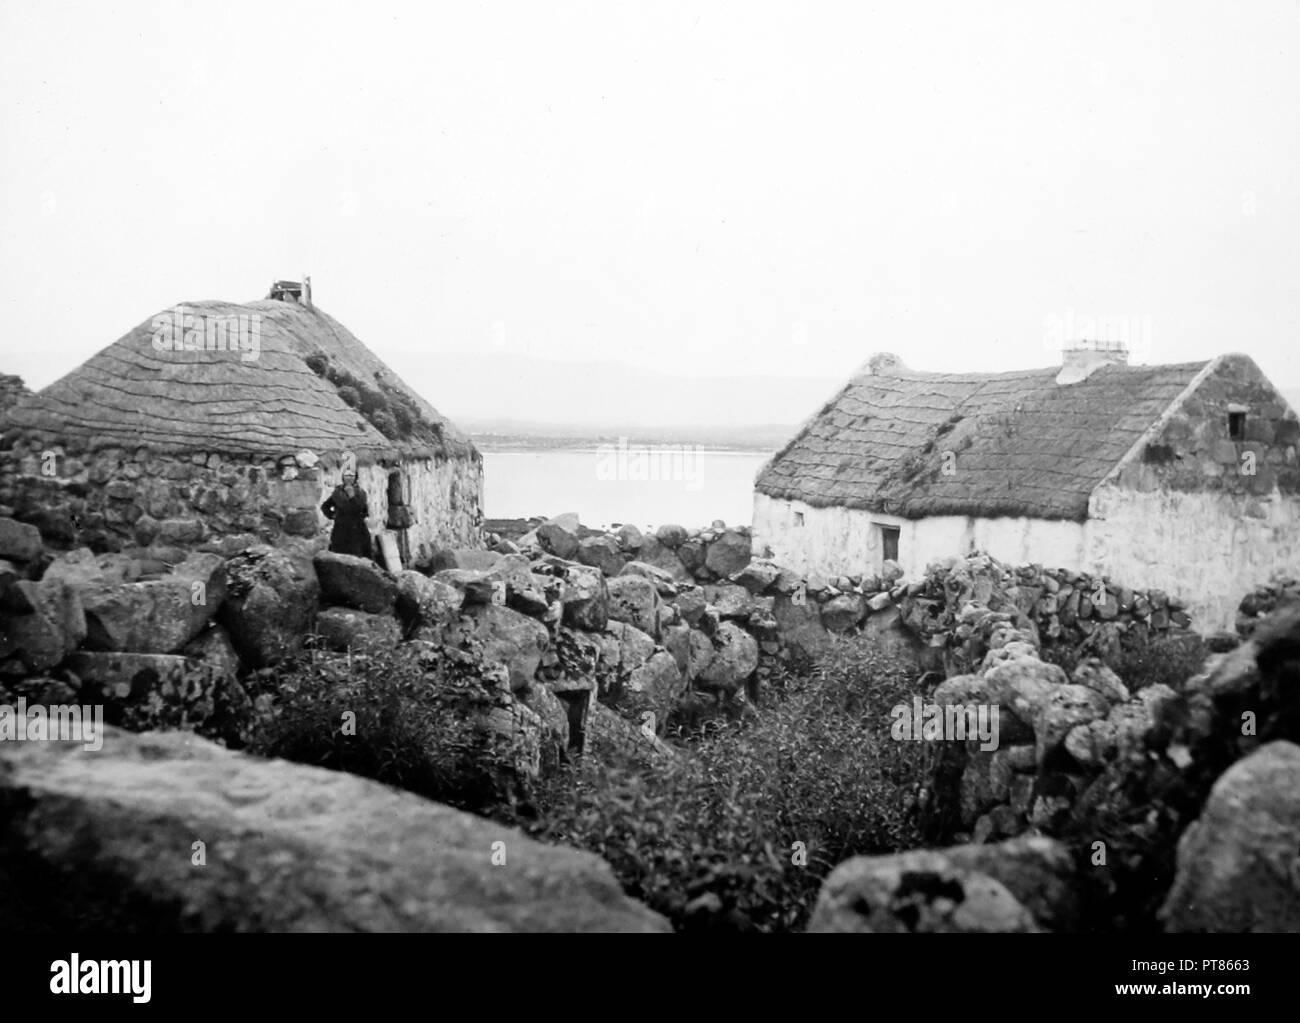 Derrynea, West of Ireland, early 1900s - Stock Image